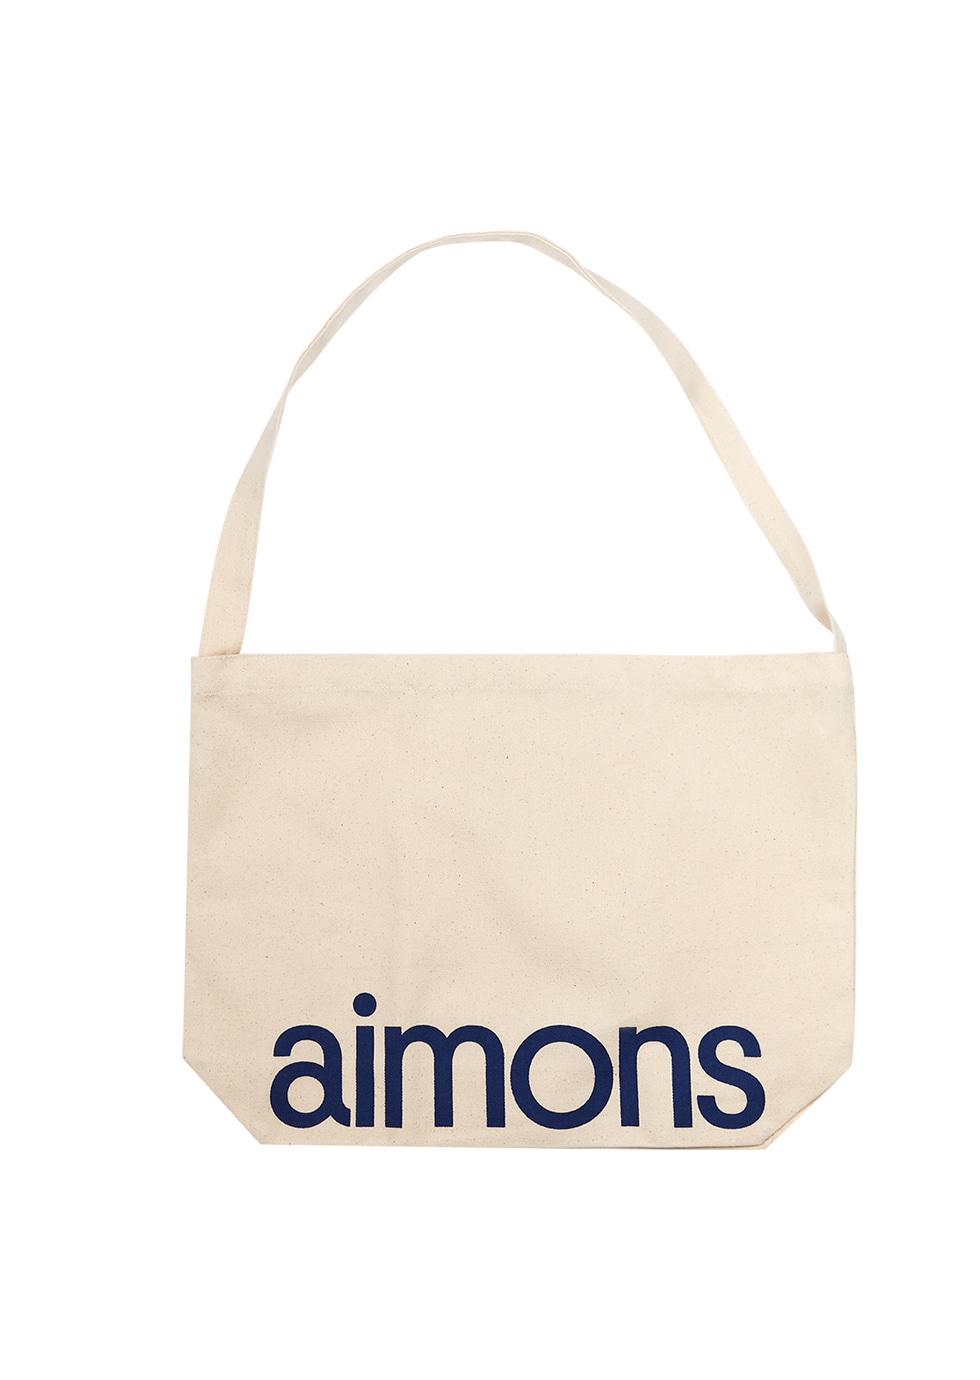 Aimons Ecobag-Ivory (M) - 에몽 공식스토어  aimons